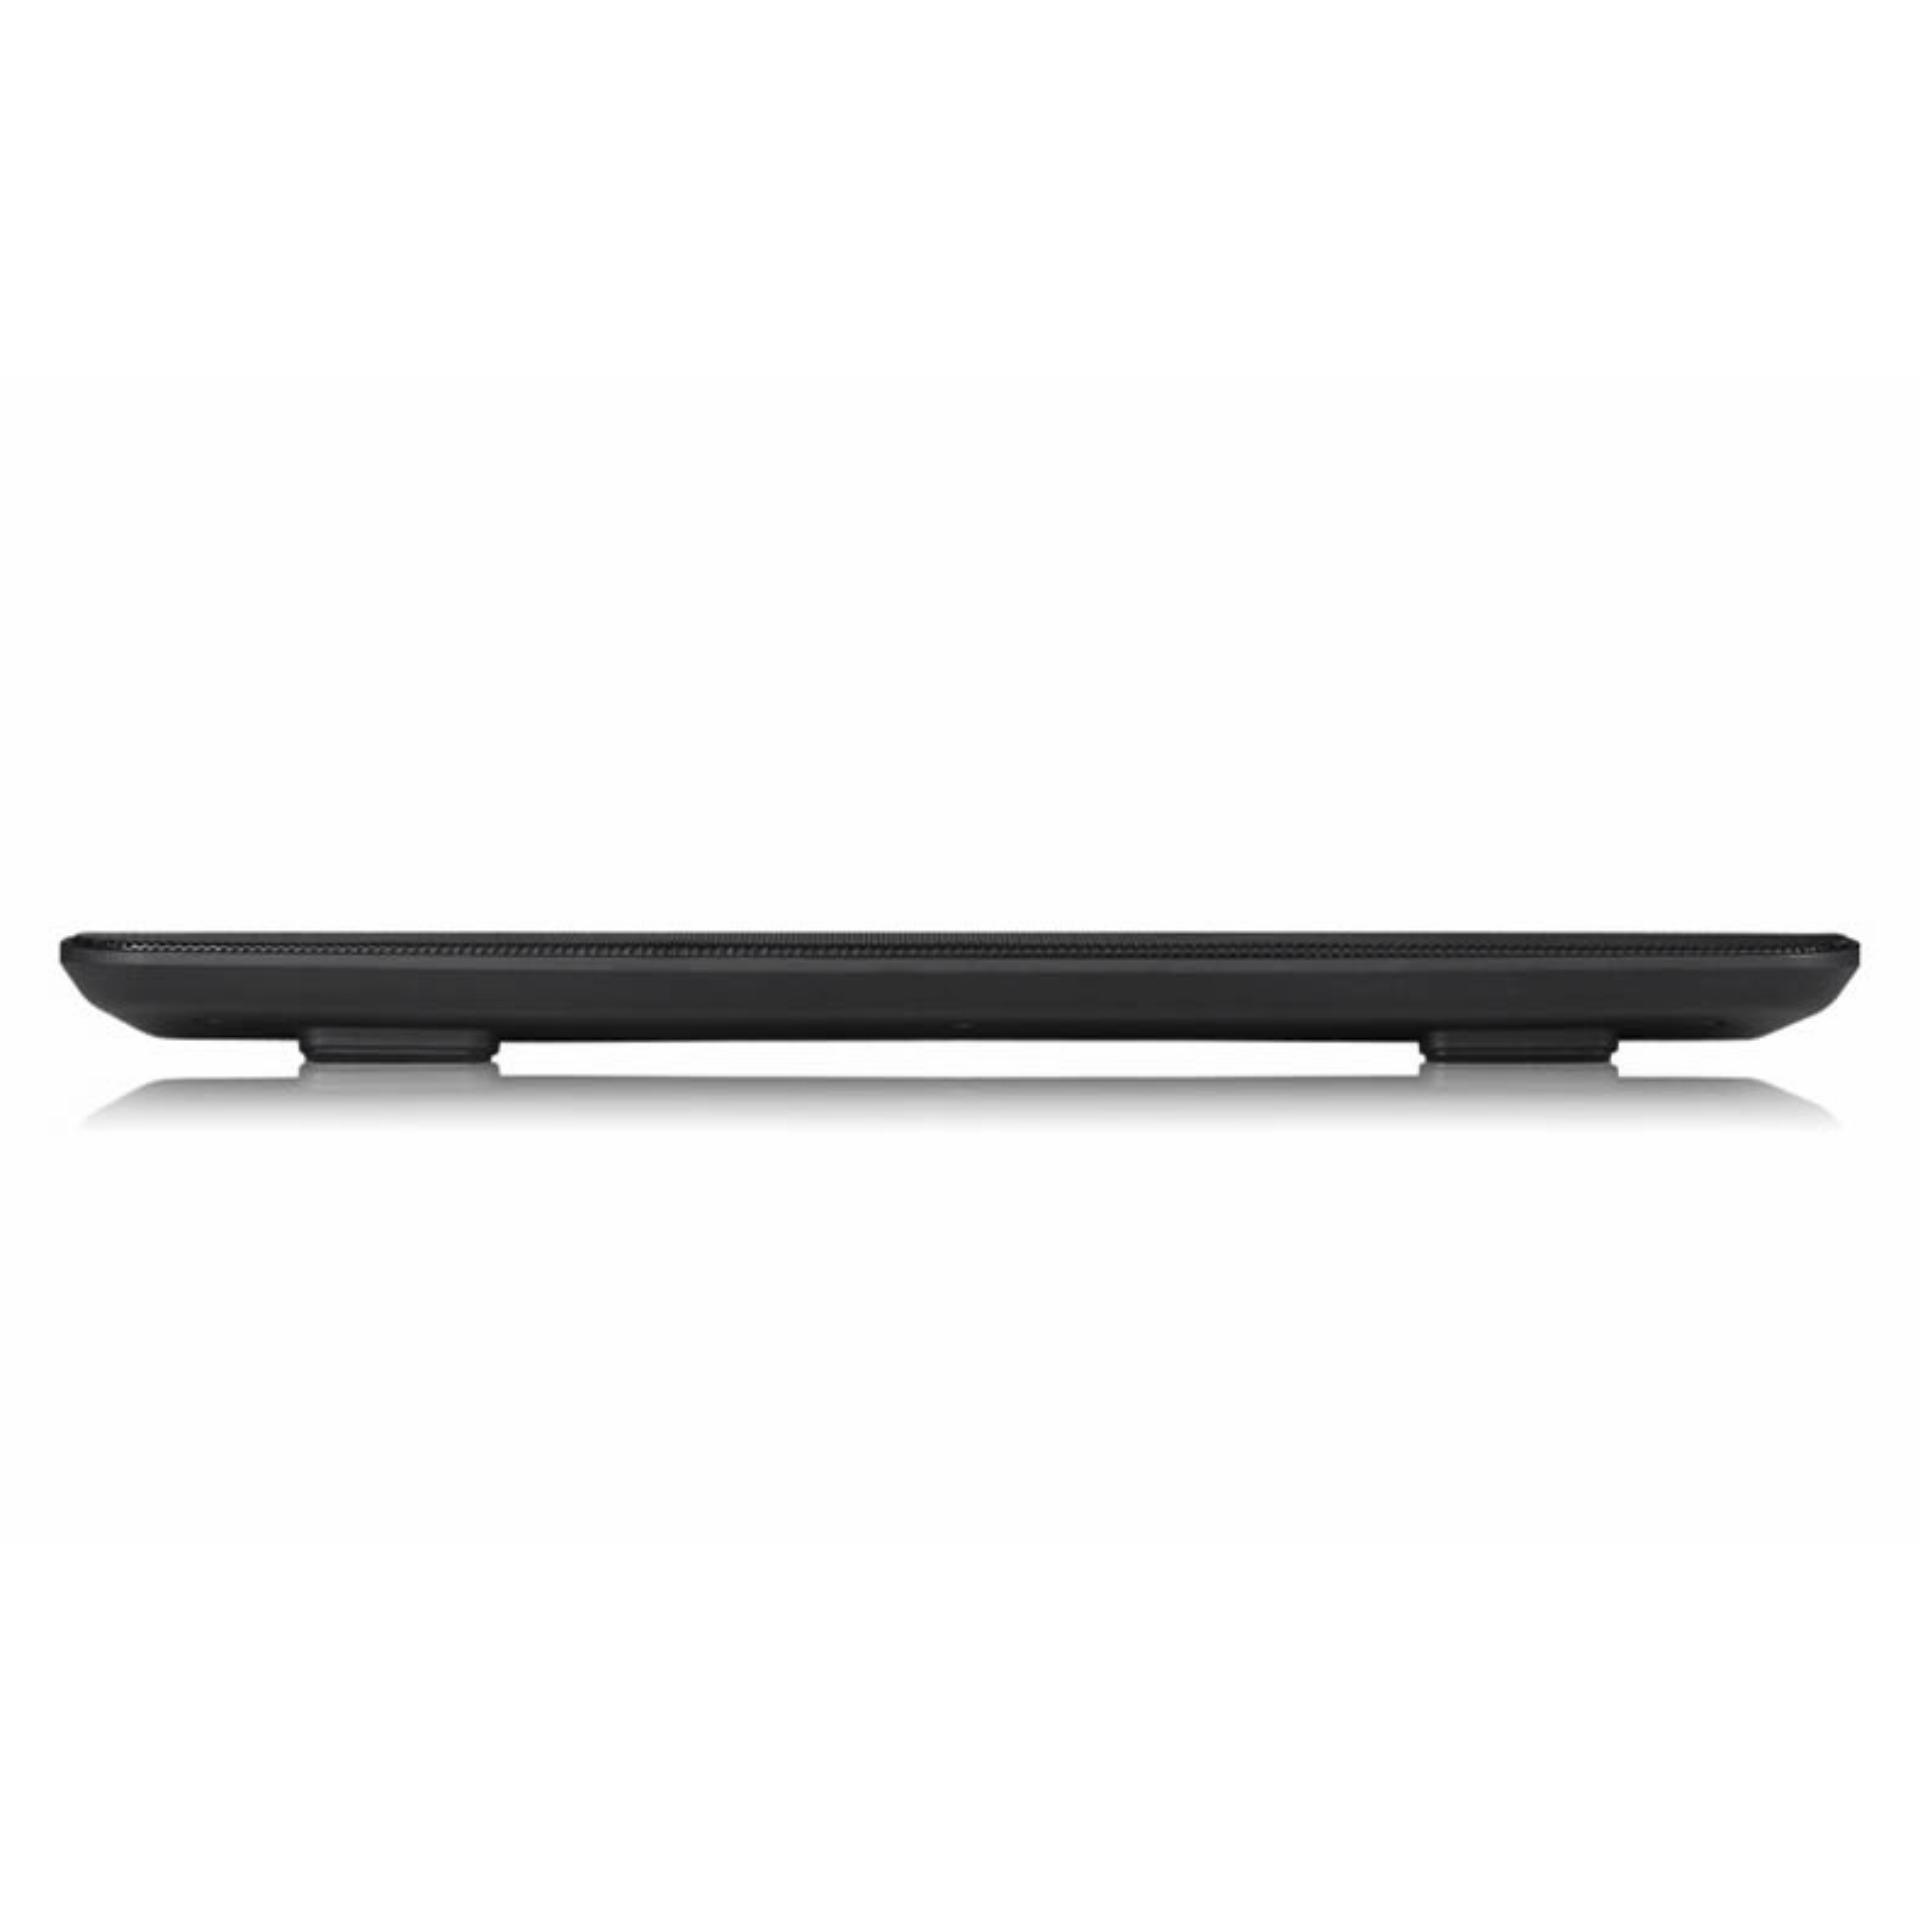 Daftar Harga Deep Cool N17 Laptop Cooling Pad Fan Coolingpad Kipas Pendingin Universal Notebook Deepcool Black